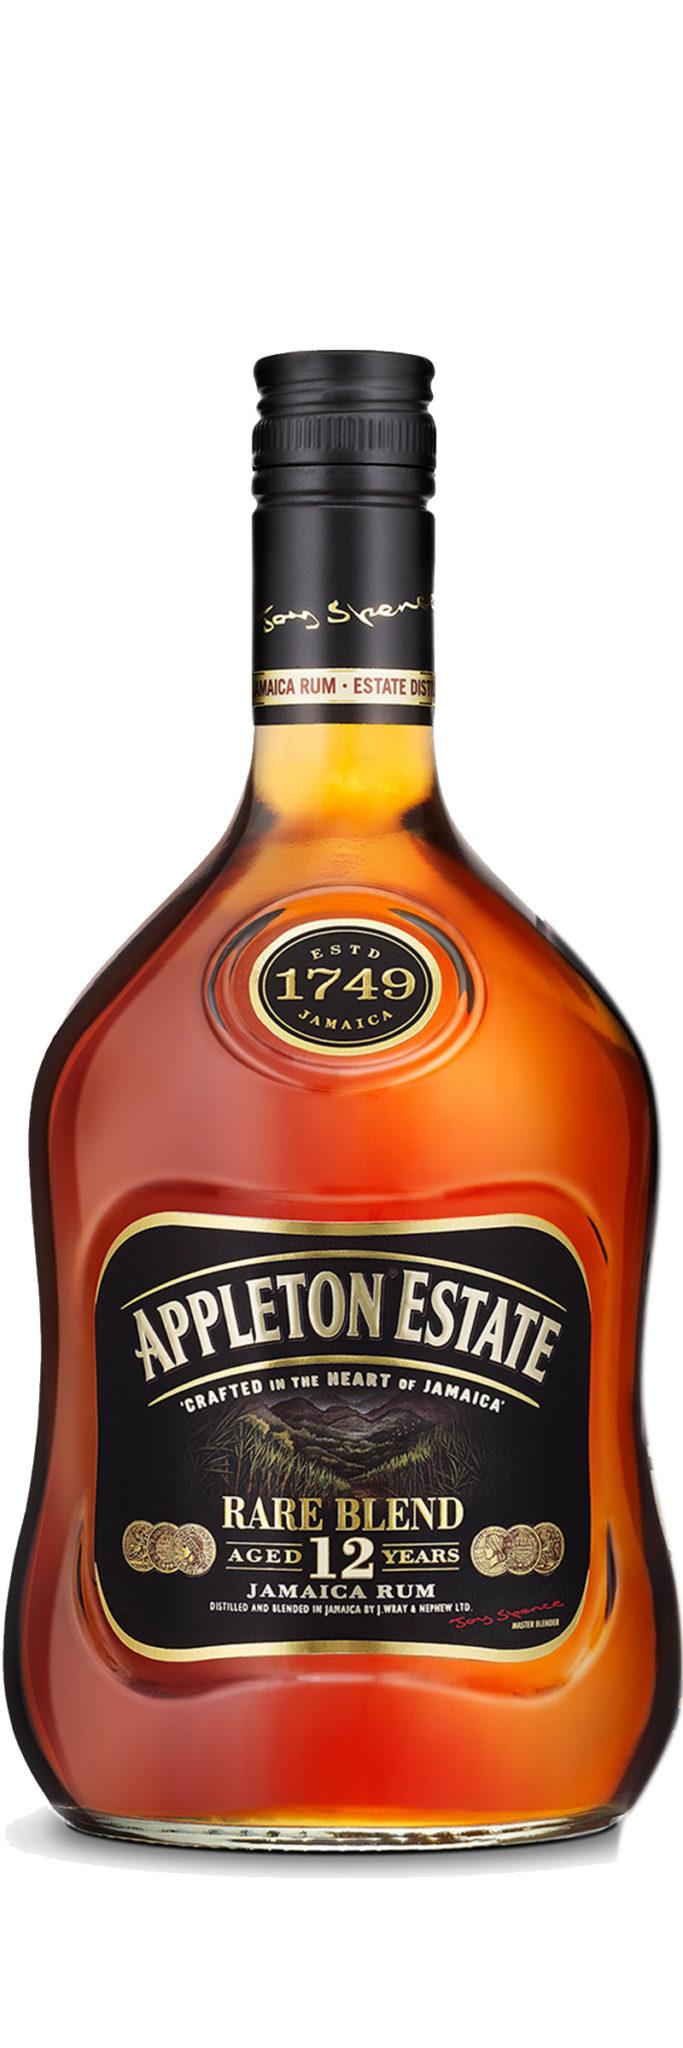 Appleton Estate Rare Blend (12 Extra) Image